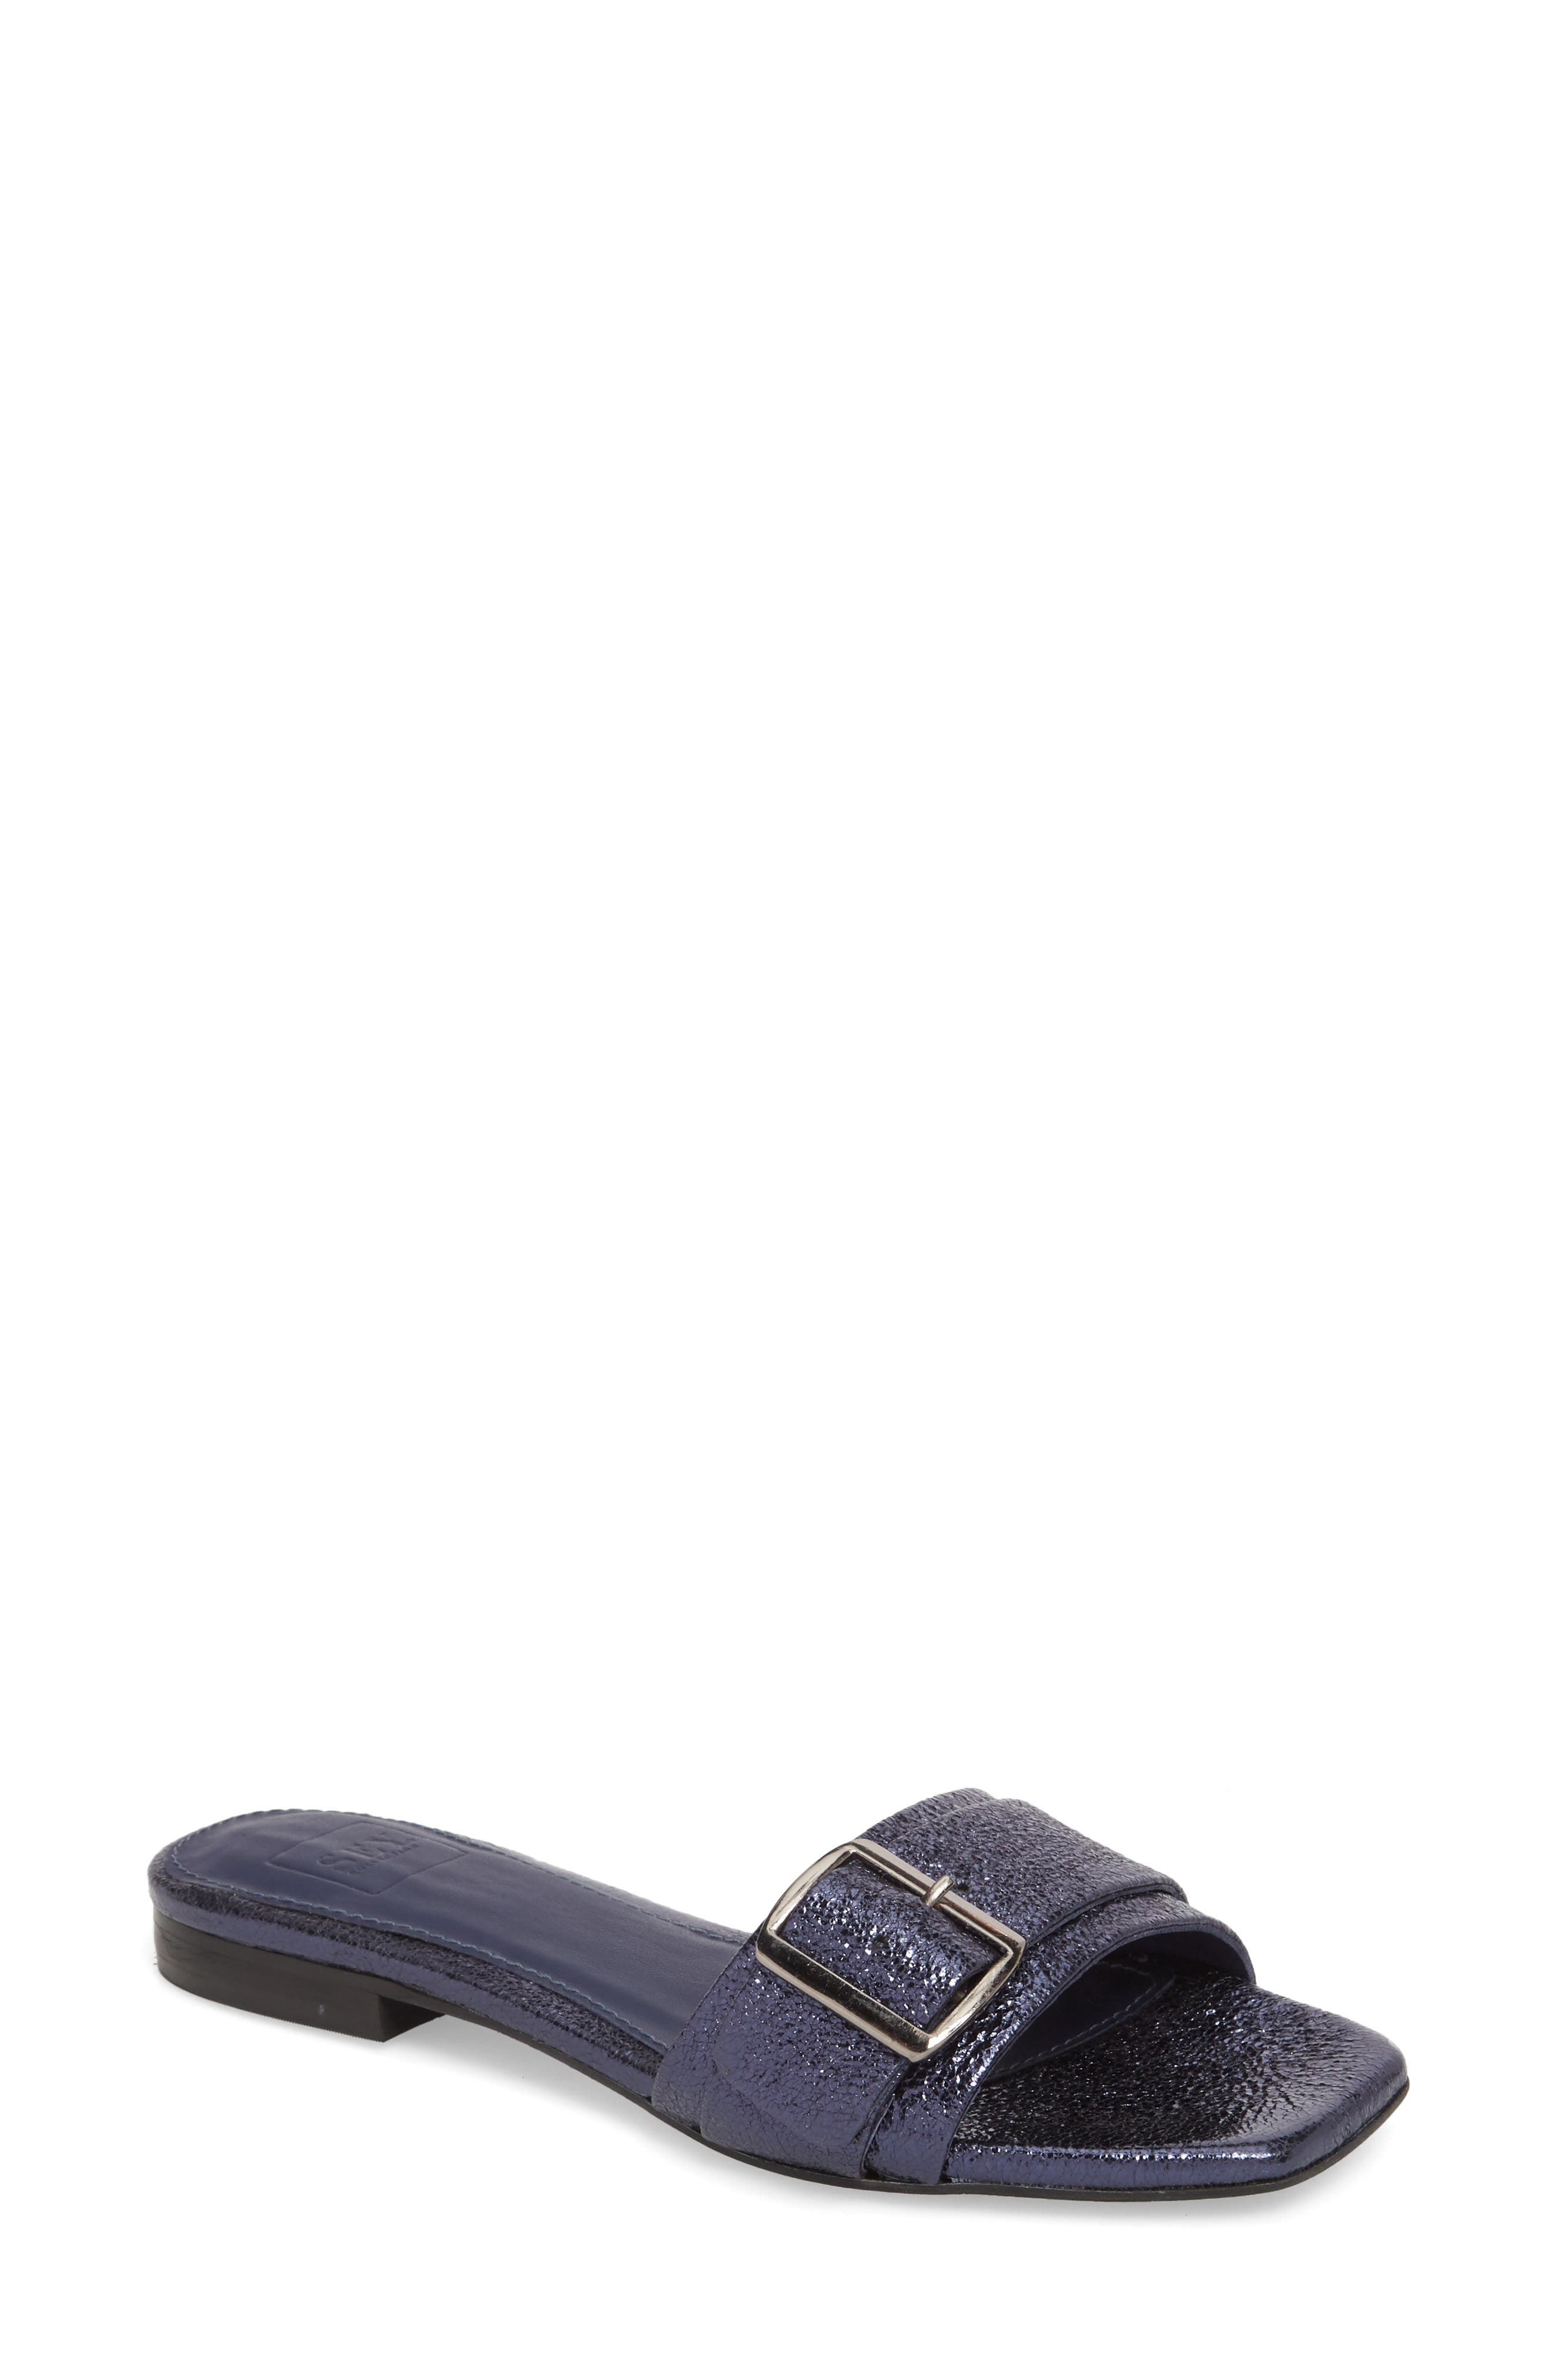 Harmonic Slide Sandal,                         Main,                         color, 410